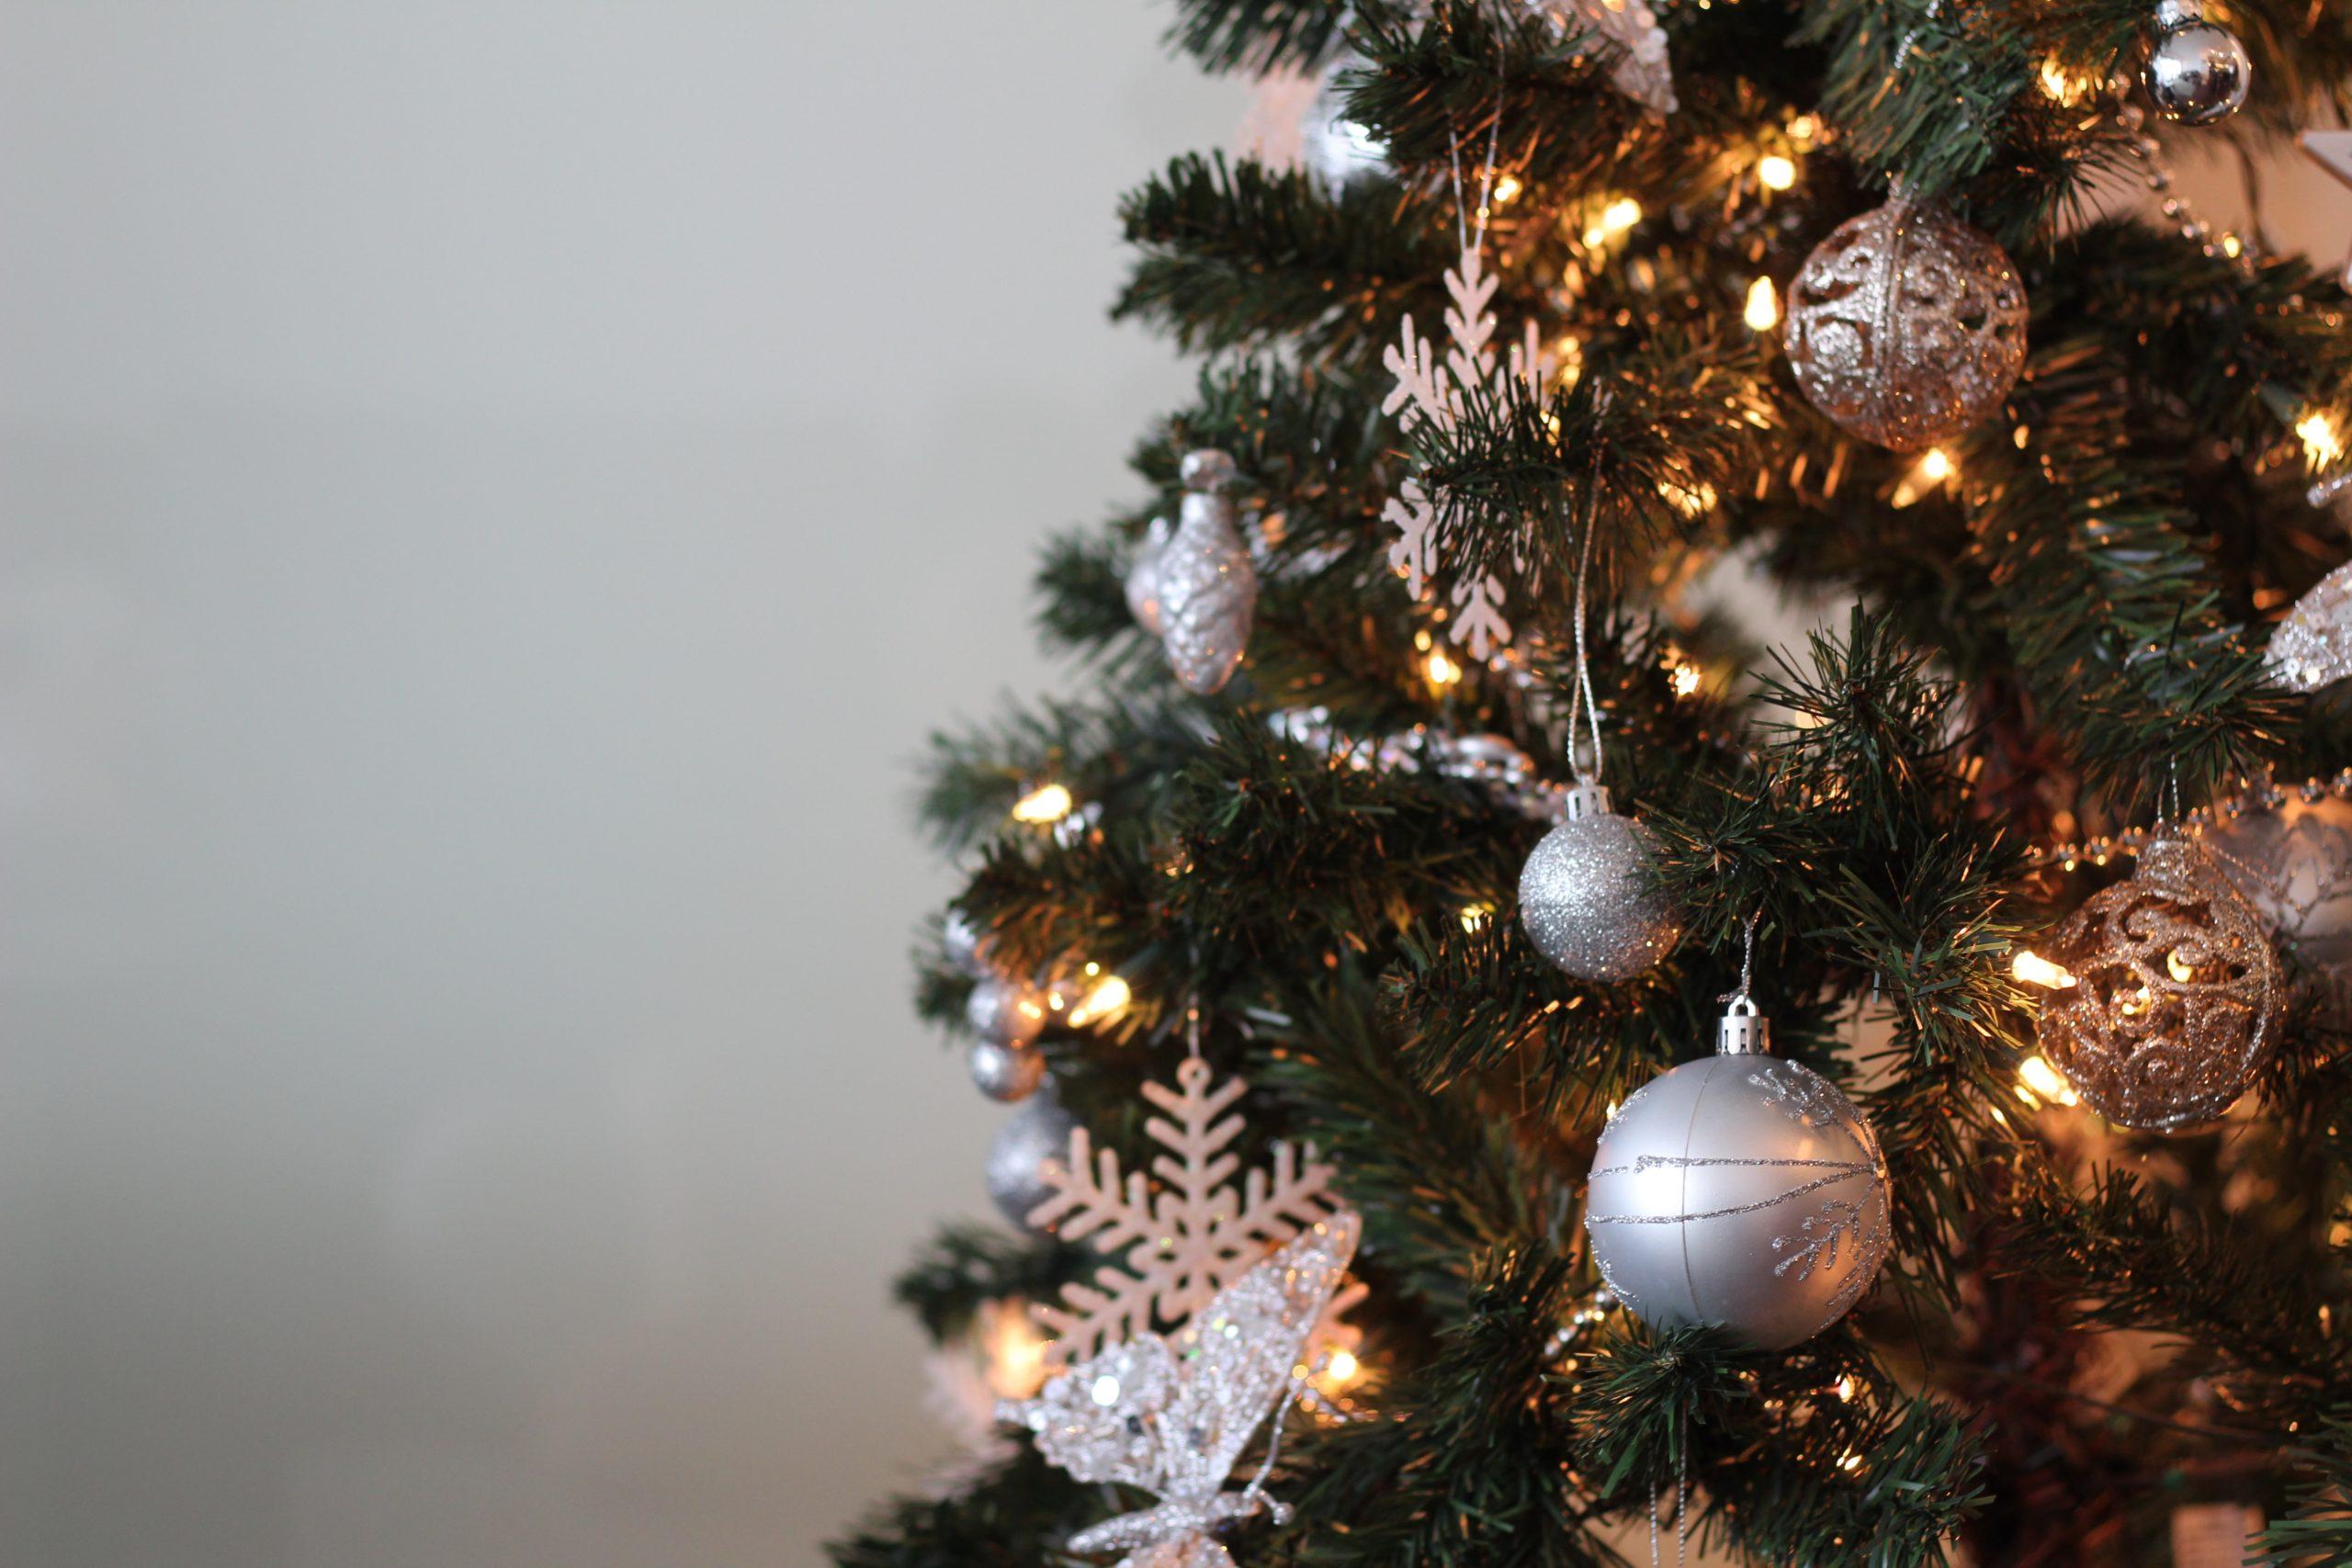 Image of holiday tree.